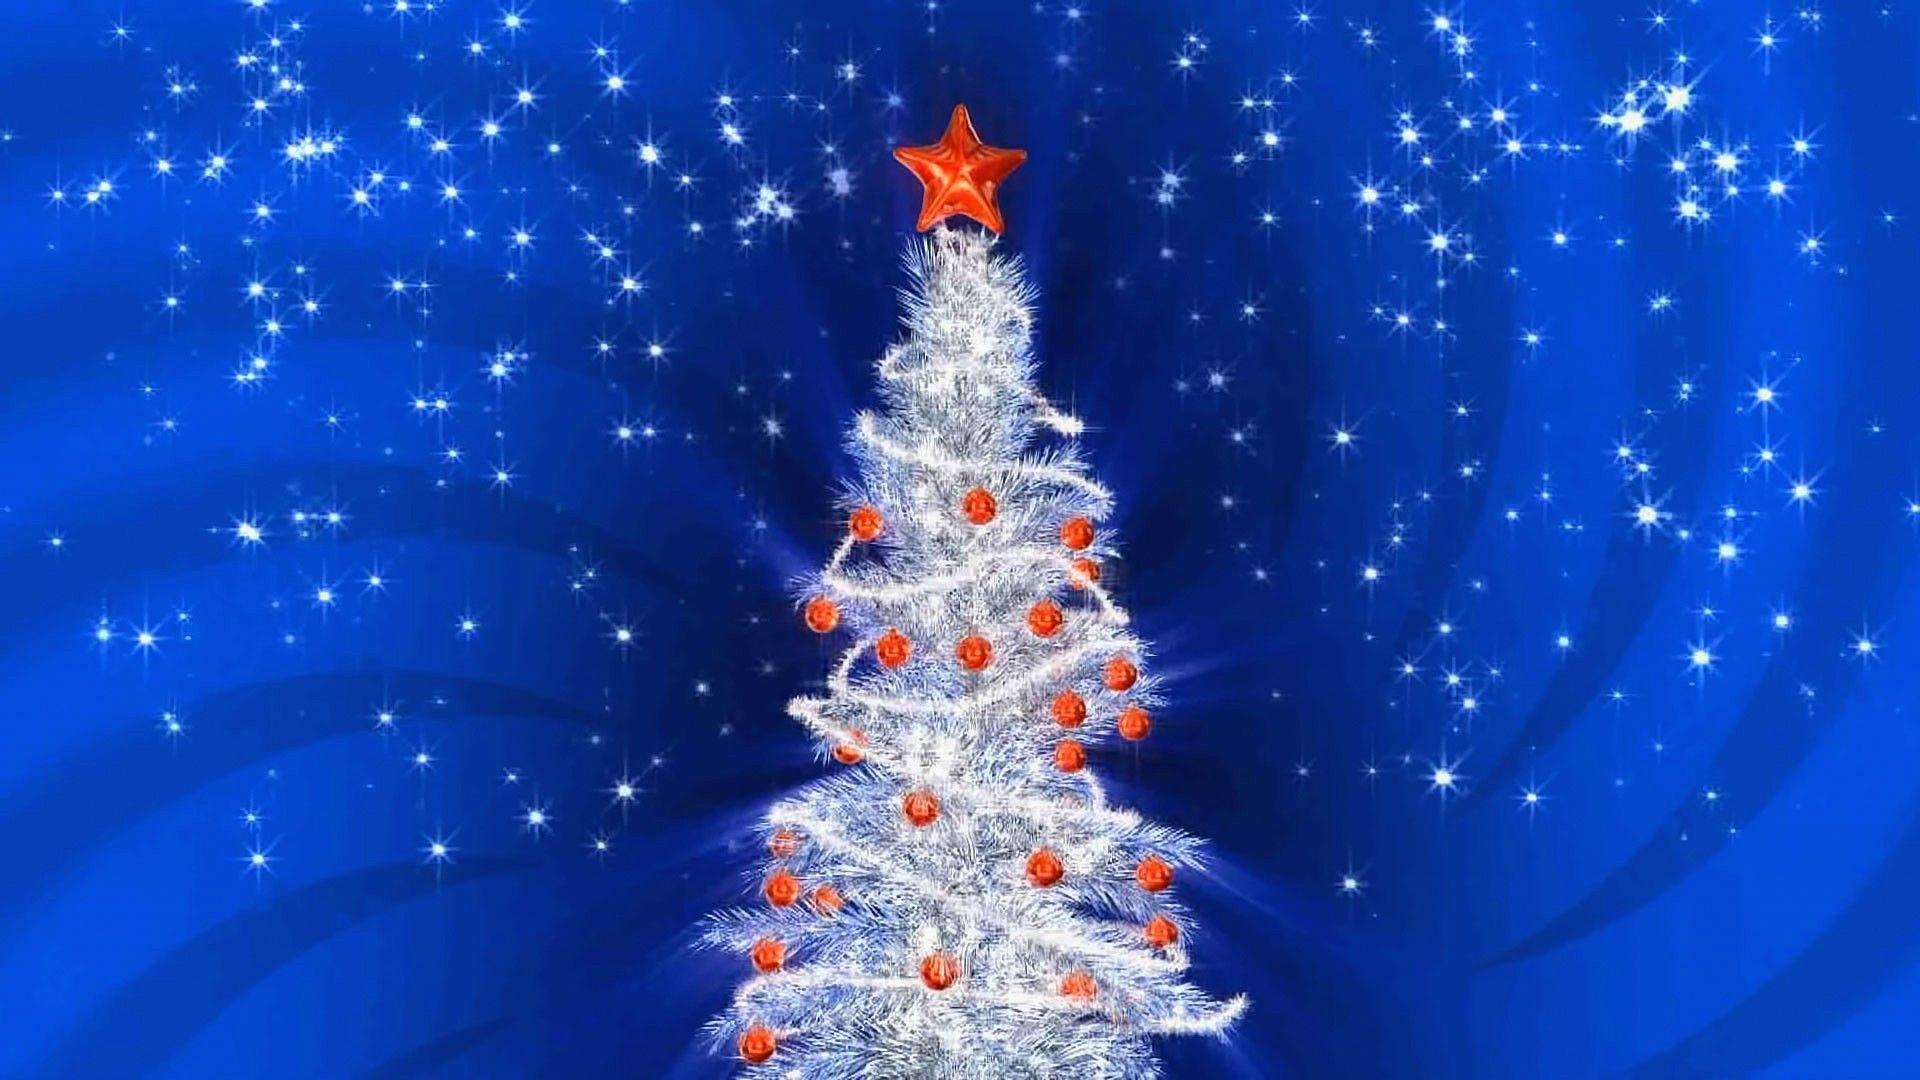 Luxury Windows Xp Christmas Wallpaper